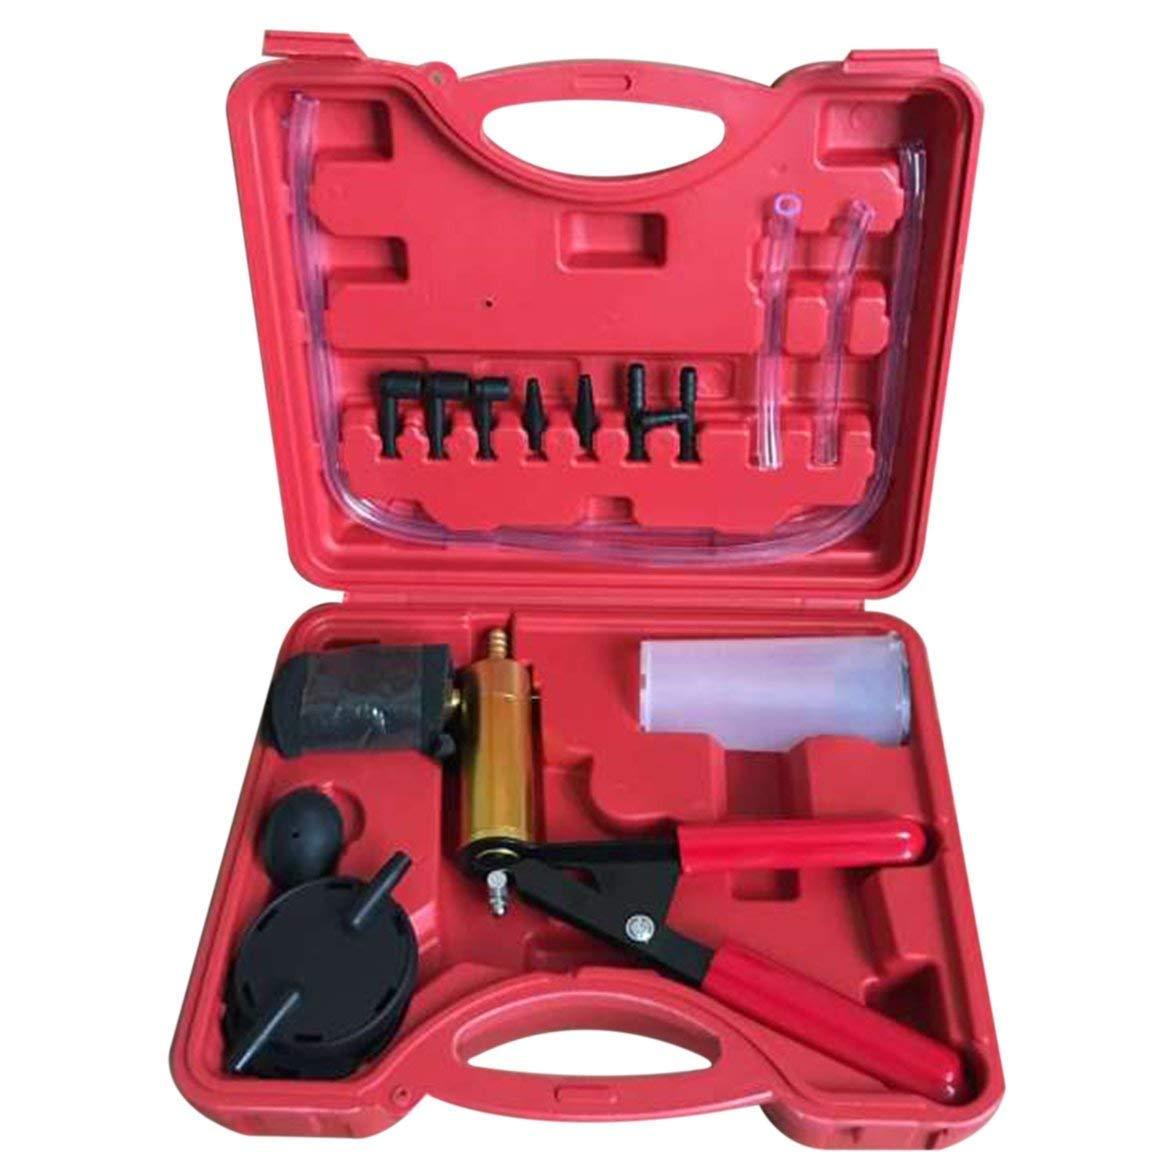 Kongqiabona Hand Held Vacuum Pump Tester Set and Brake Bleeder Kit Car Motorbike Self Vacuum Pump Screw Adapter with Vacuum Gauge